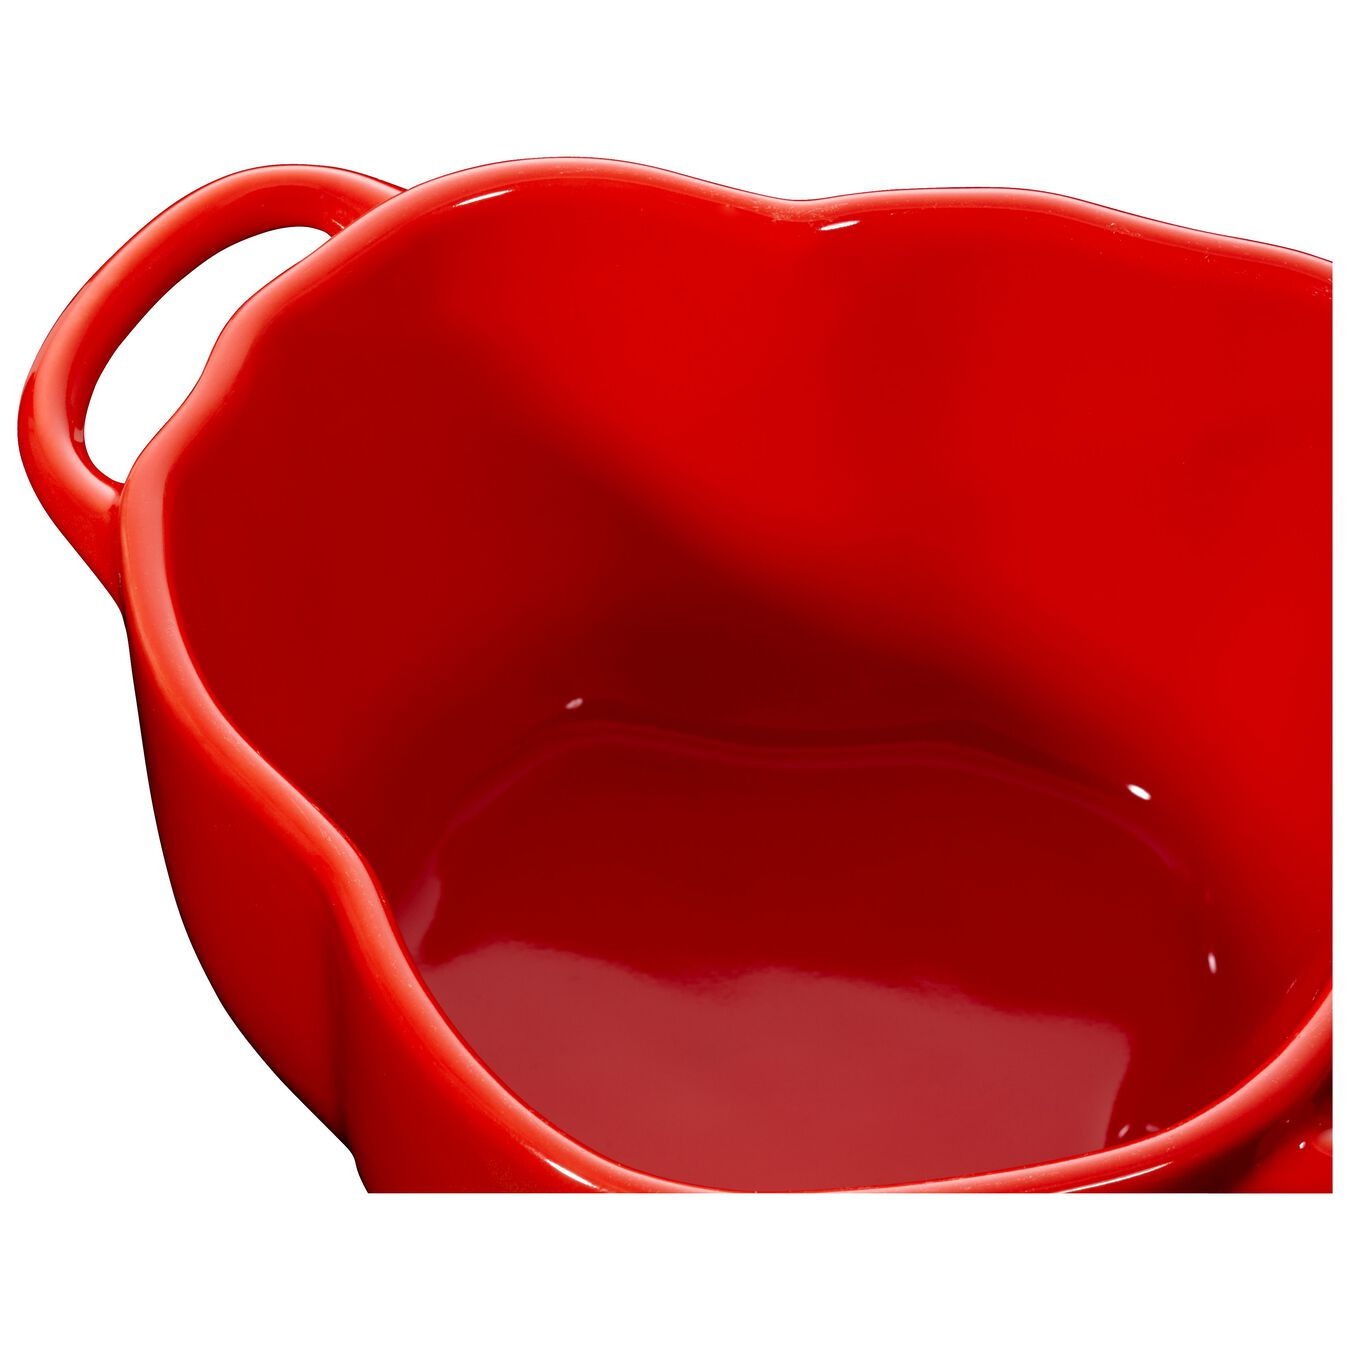 Seramik kap | Seramik | 450 ml | Portakal Kırmızısı,,large 4